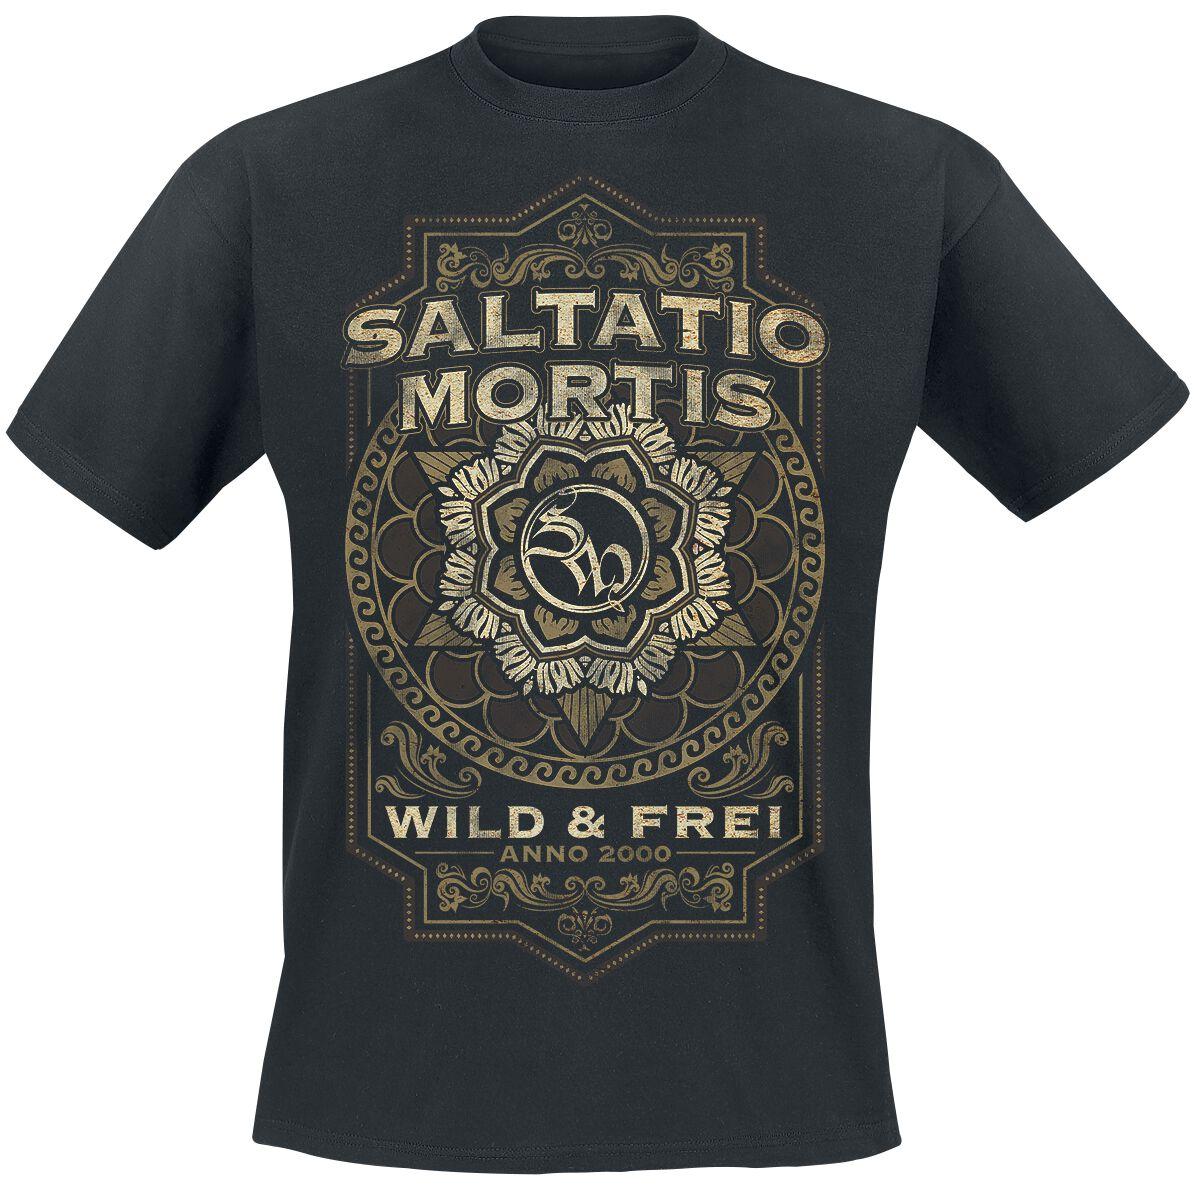 Zespoły - Koszulki - T-Shirt Saltatio Mortis Flourish Mandala T-Shirt czarny - 359978